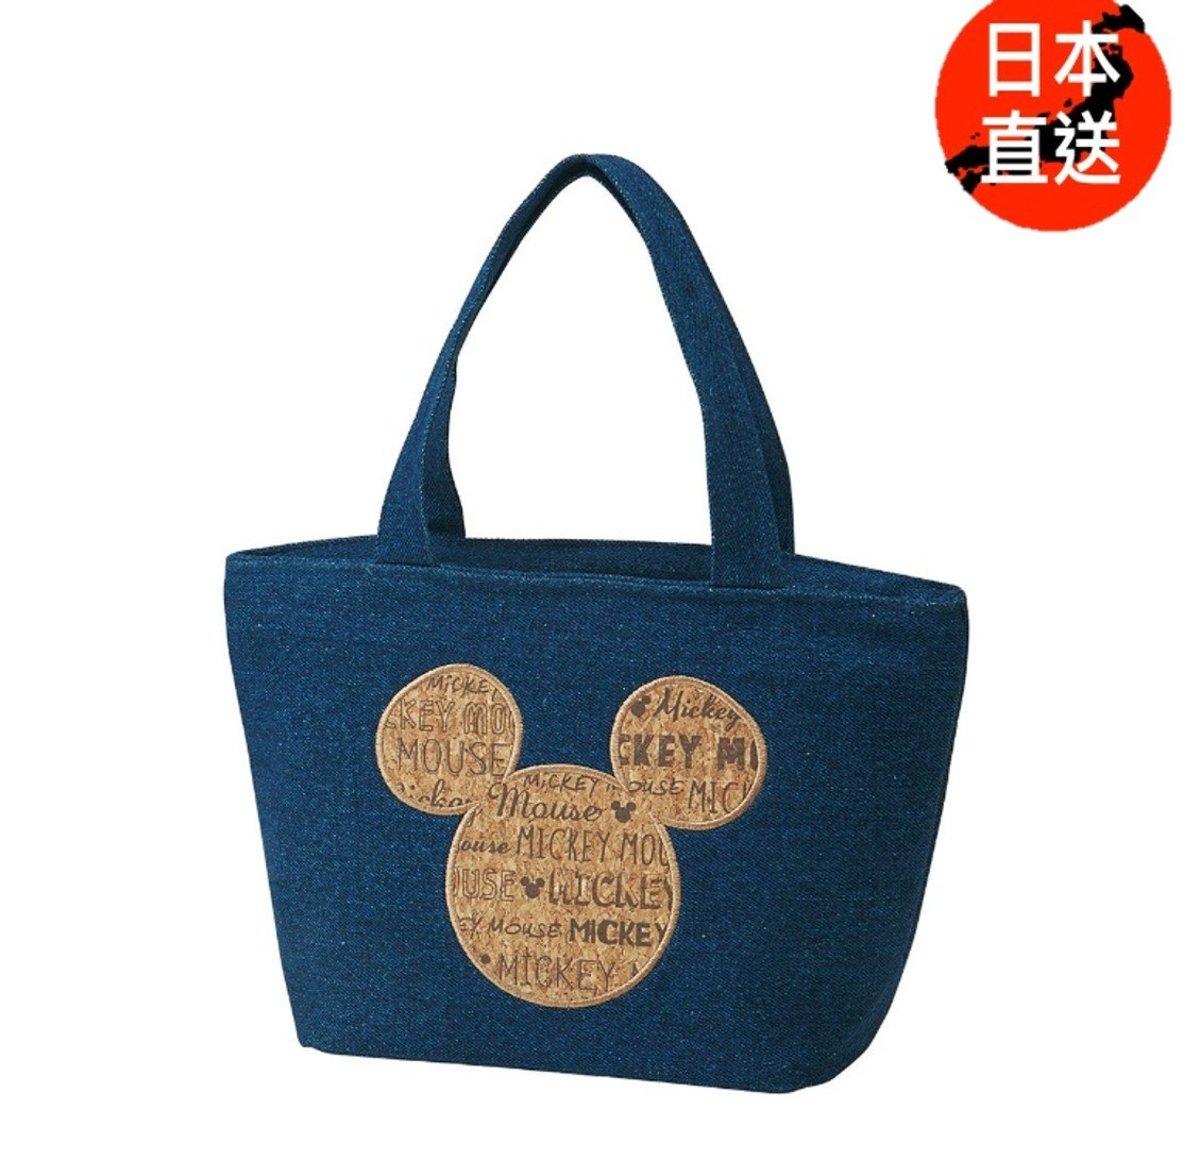 Lunch Bag (Licensed by Disney)